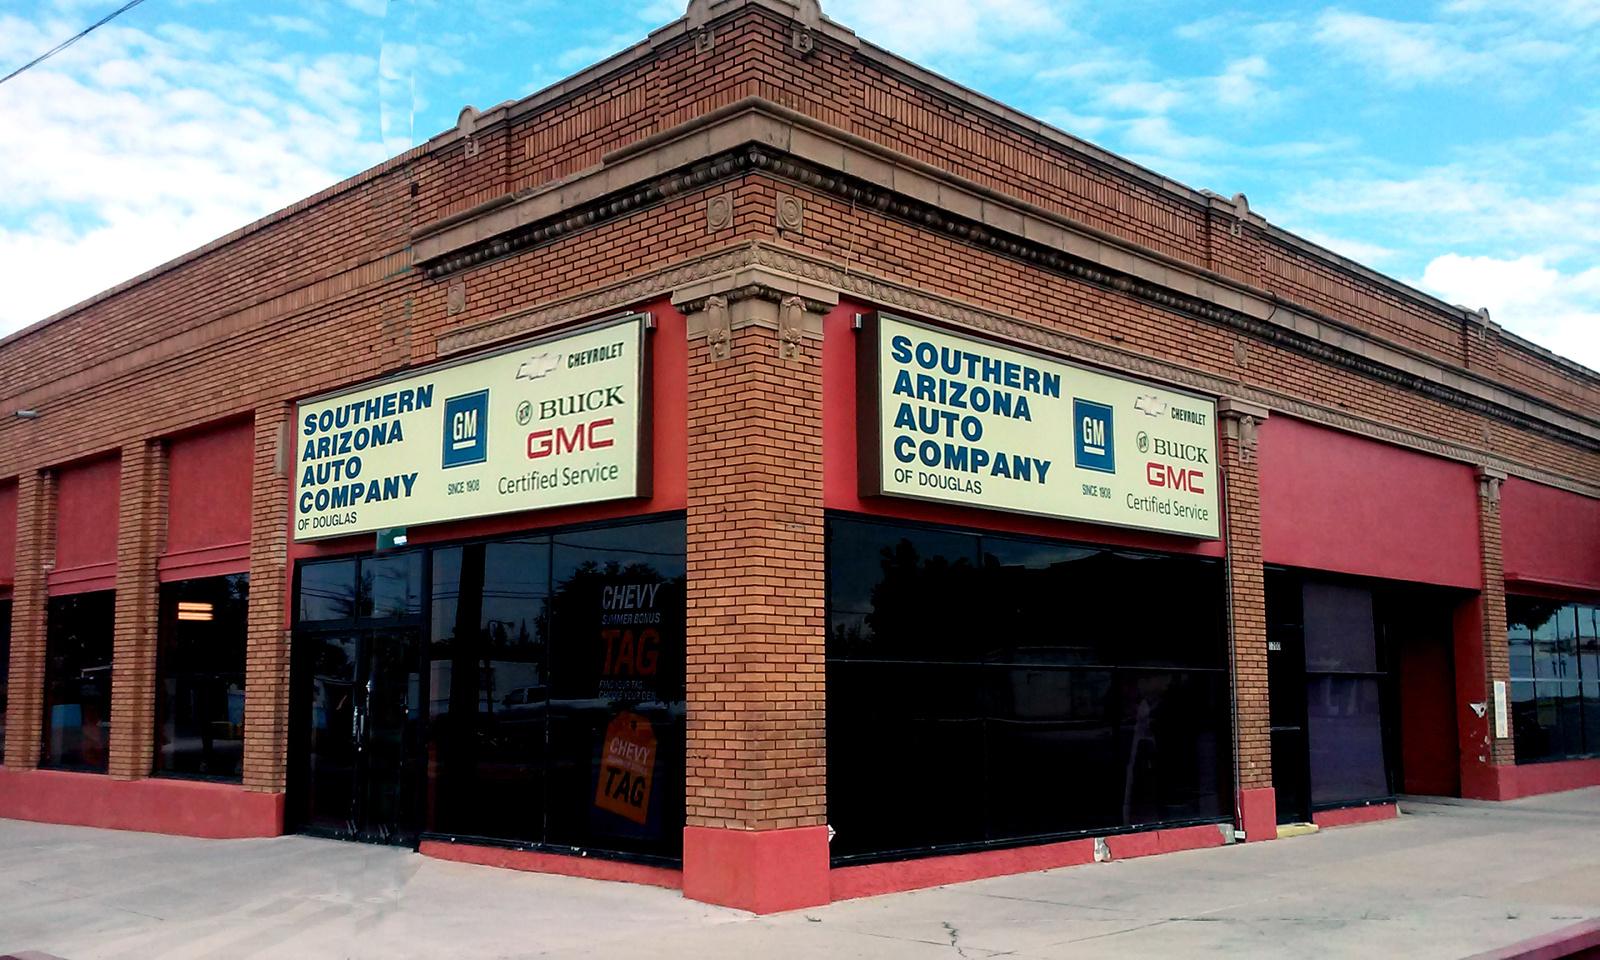 Honda Dealership Az >> Southern Arizona Auto Company of Douglas - Douglas, AZ - Reviews & Deals - CarGurus